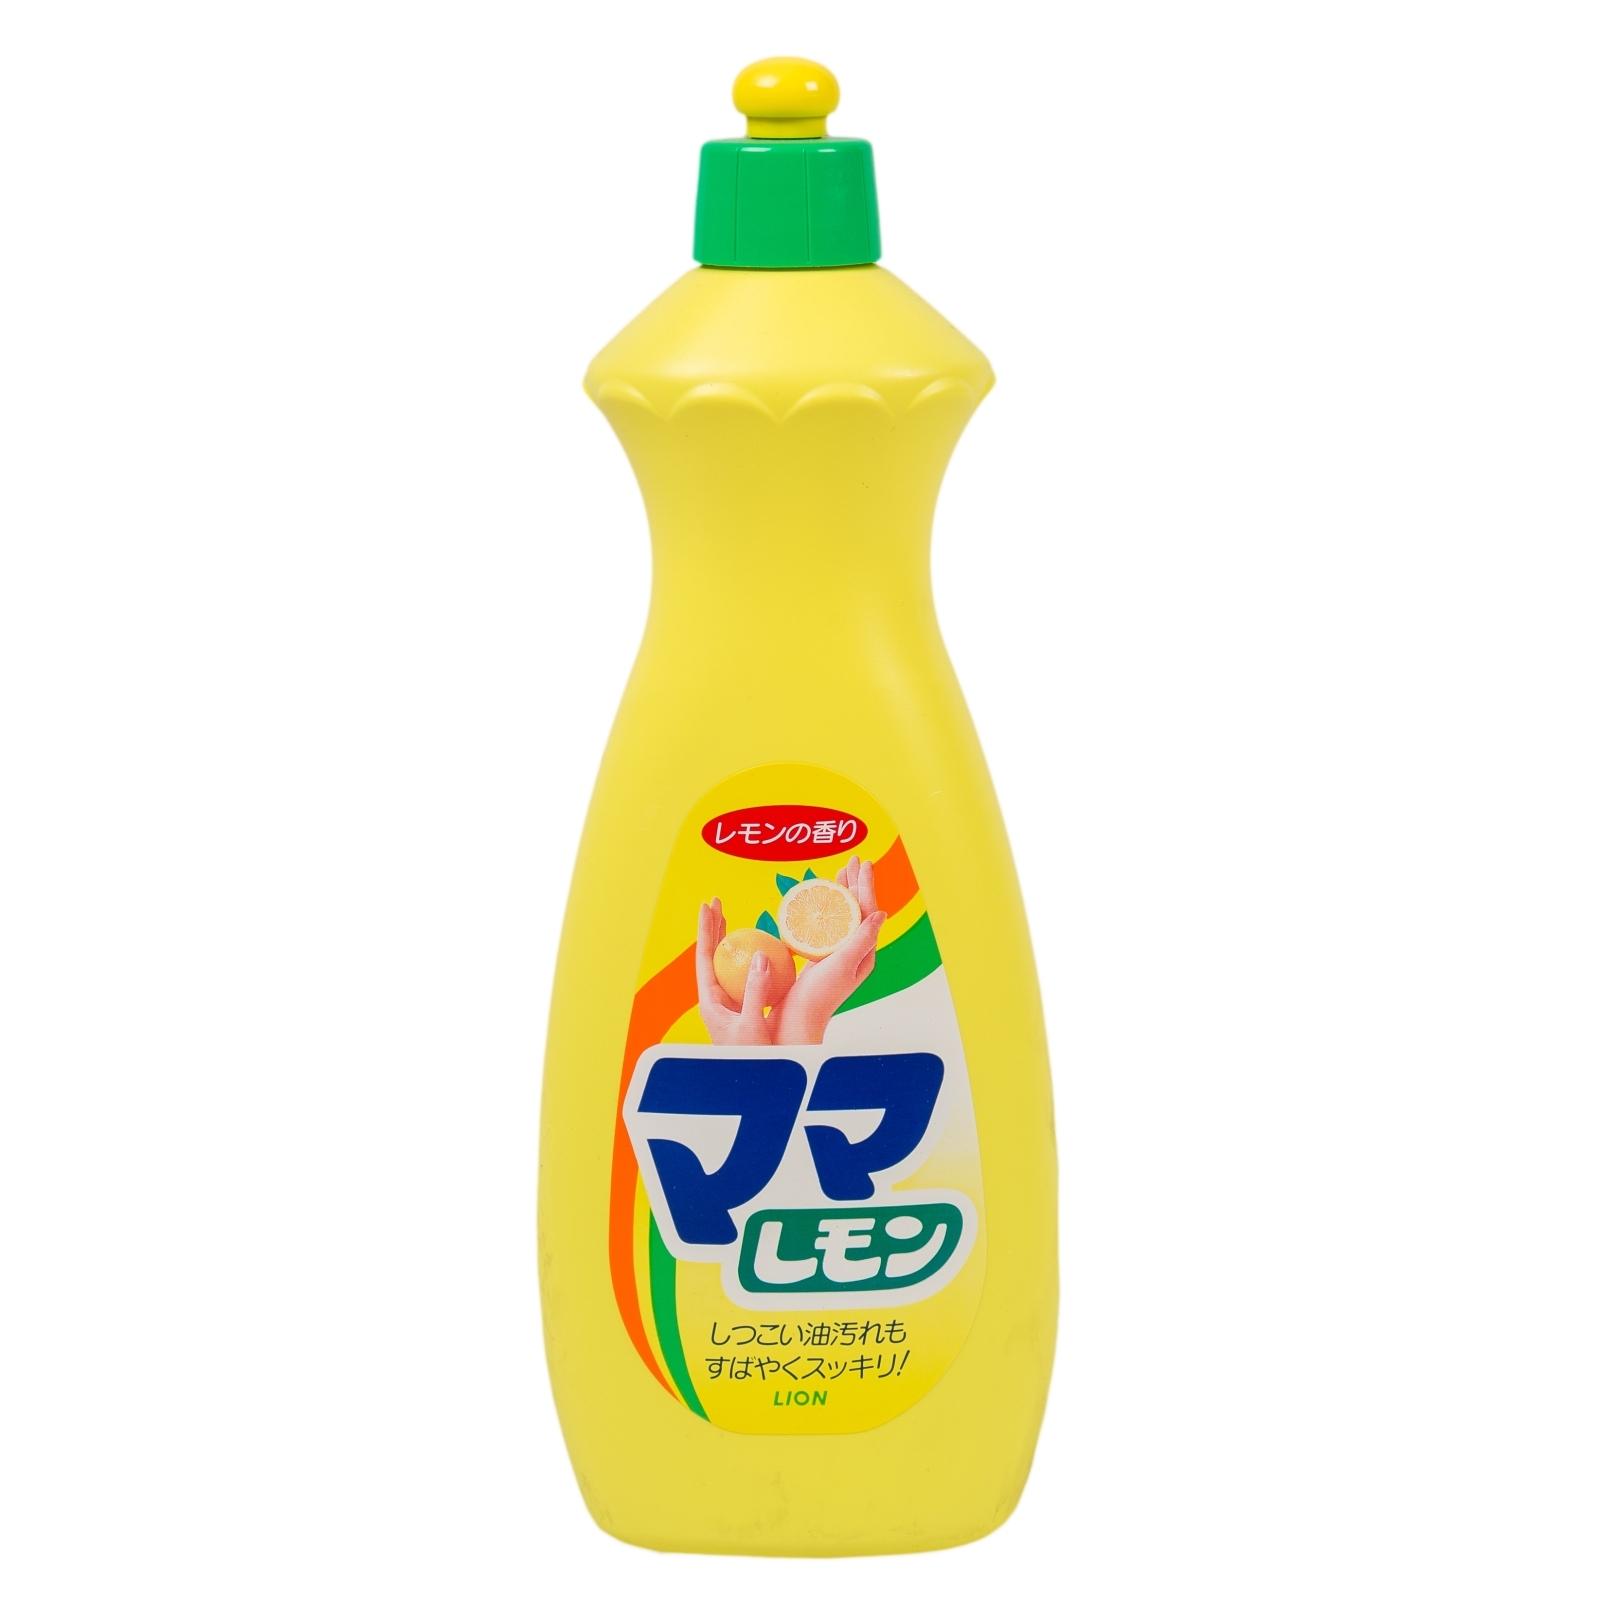 Средство для мытья посуды Lion  Mama Lemon 800 мл. (флакон)<br>